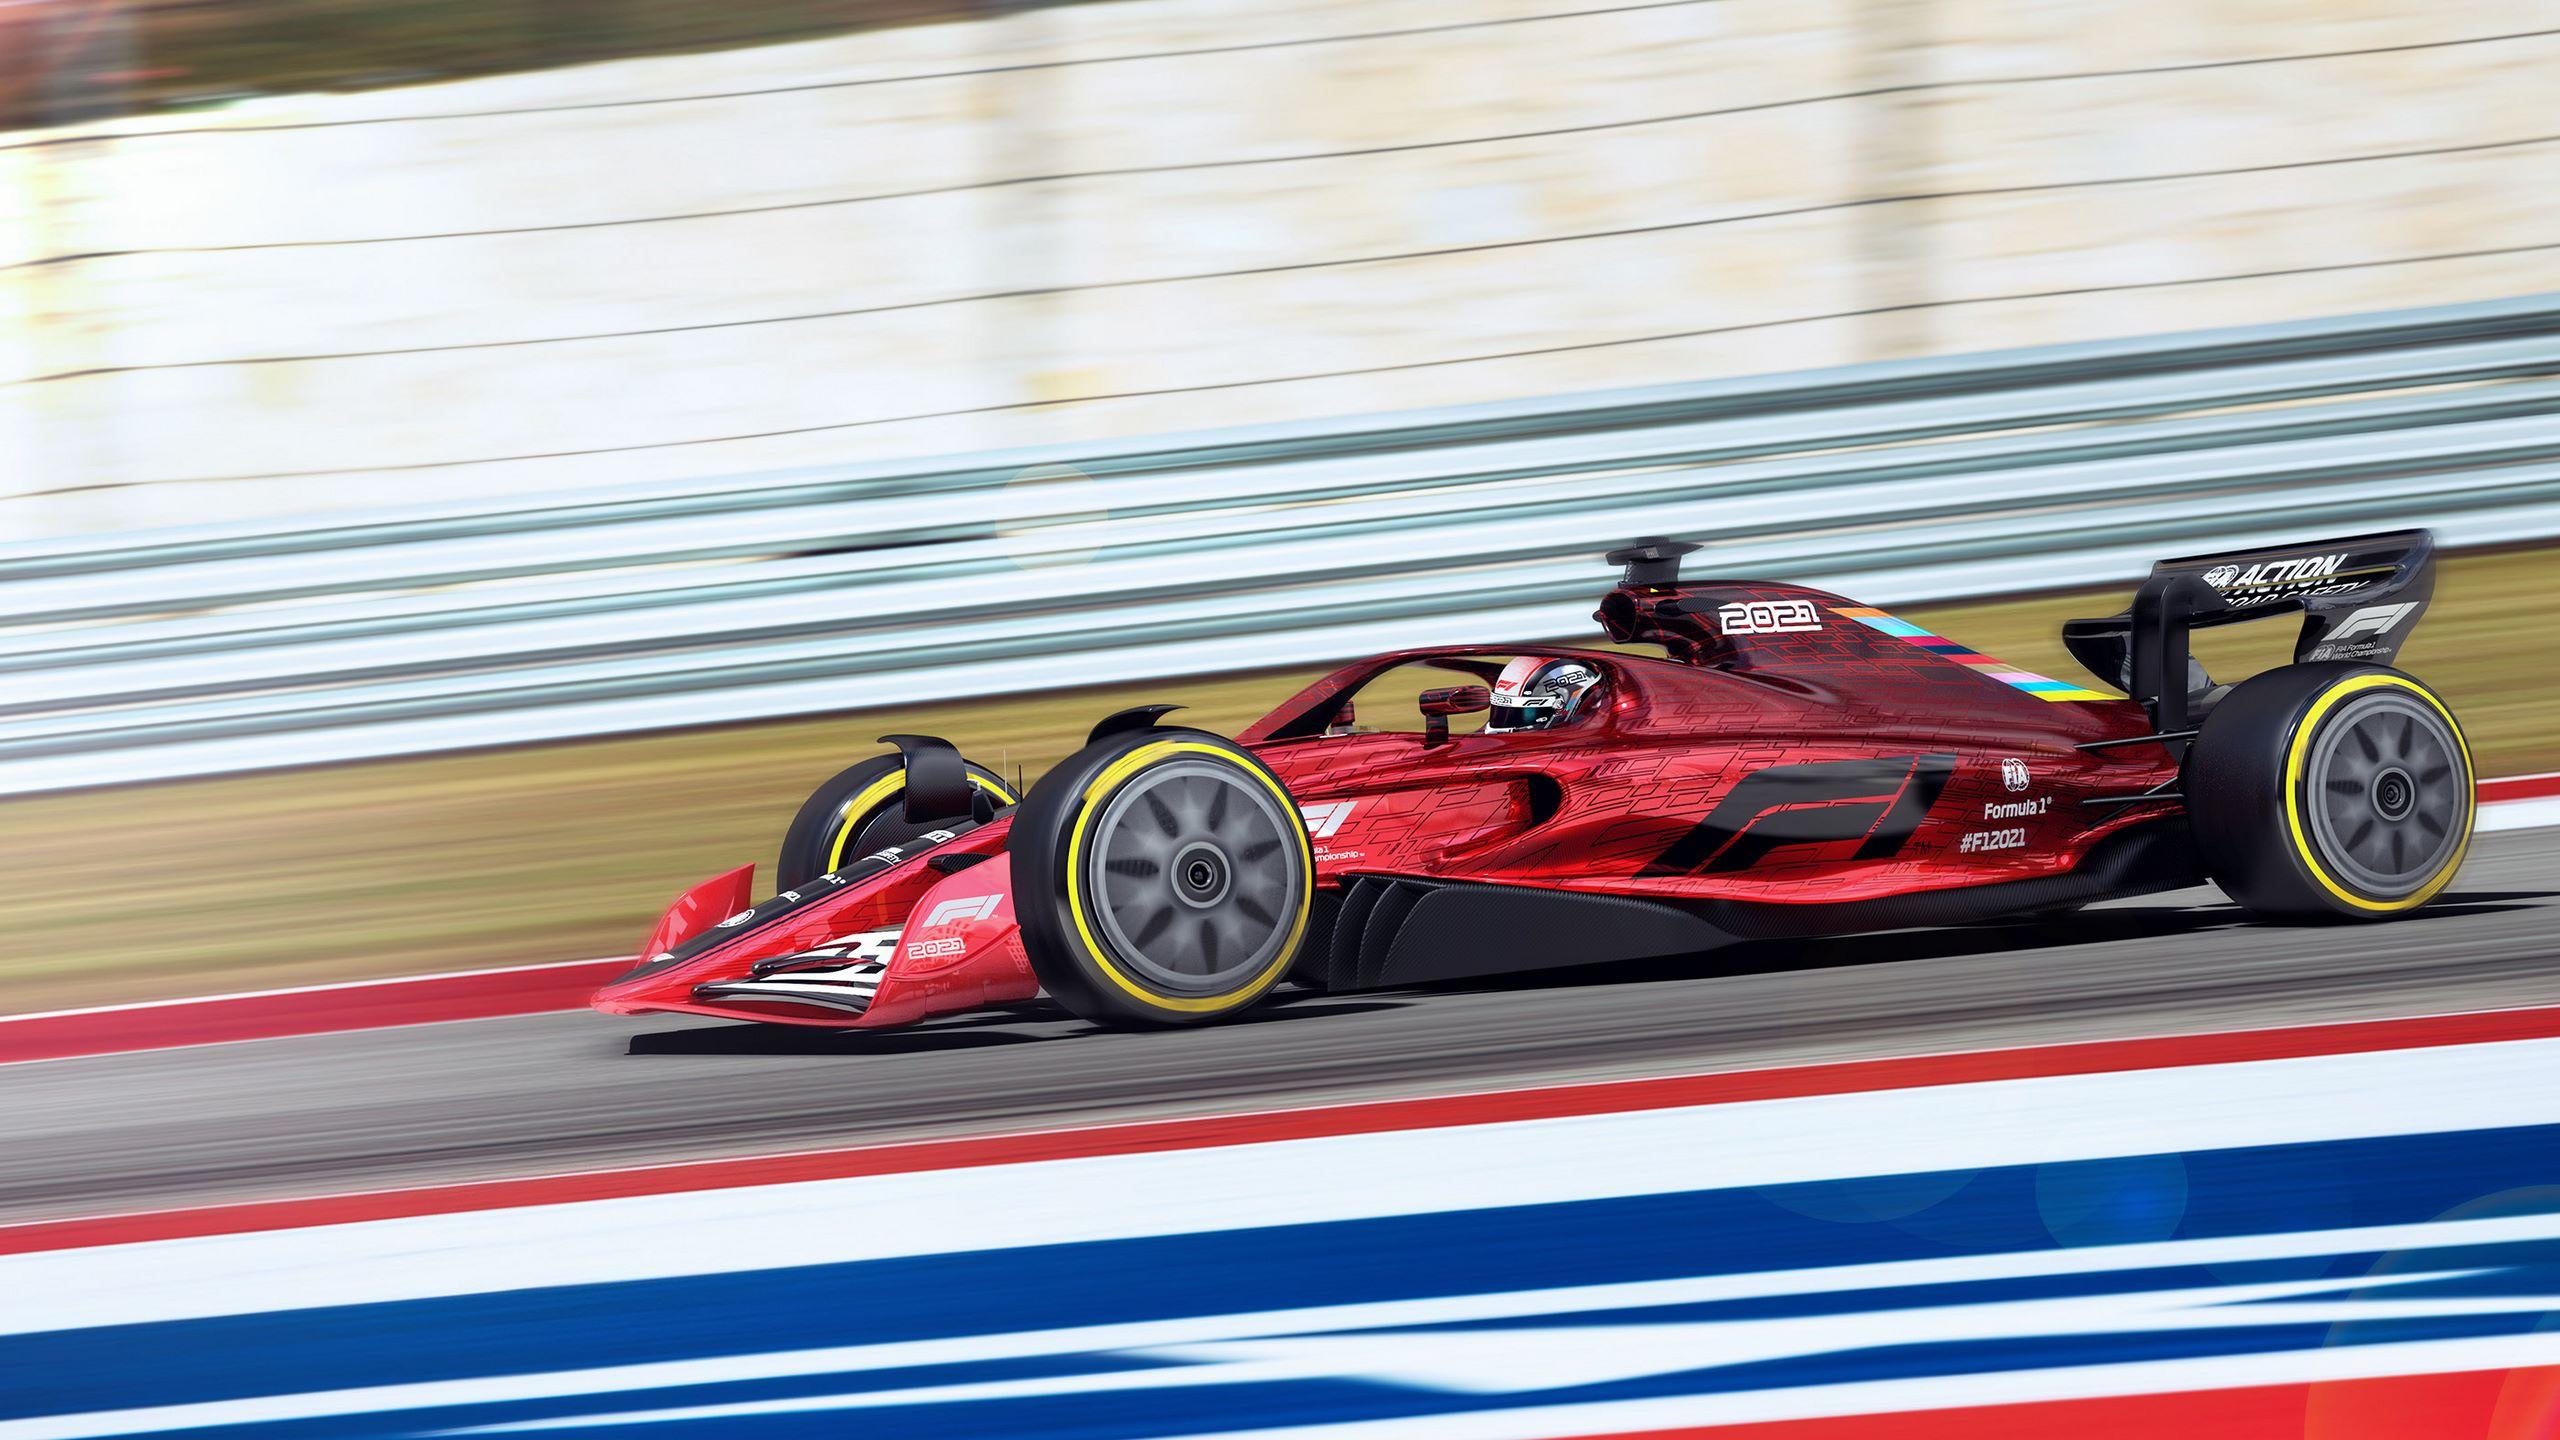 2021-formula-1-race-car-rendering f1 (10)